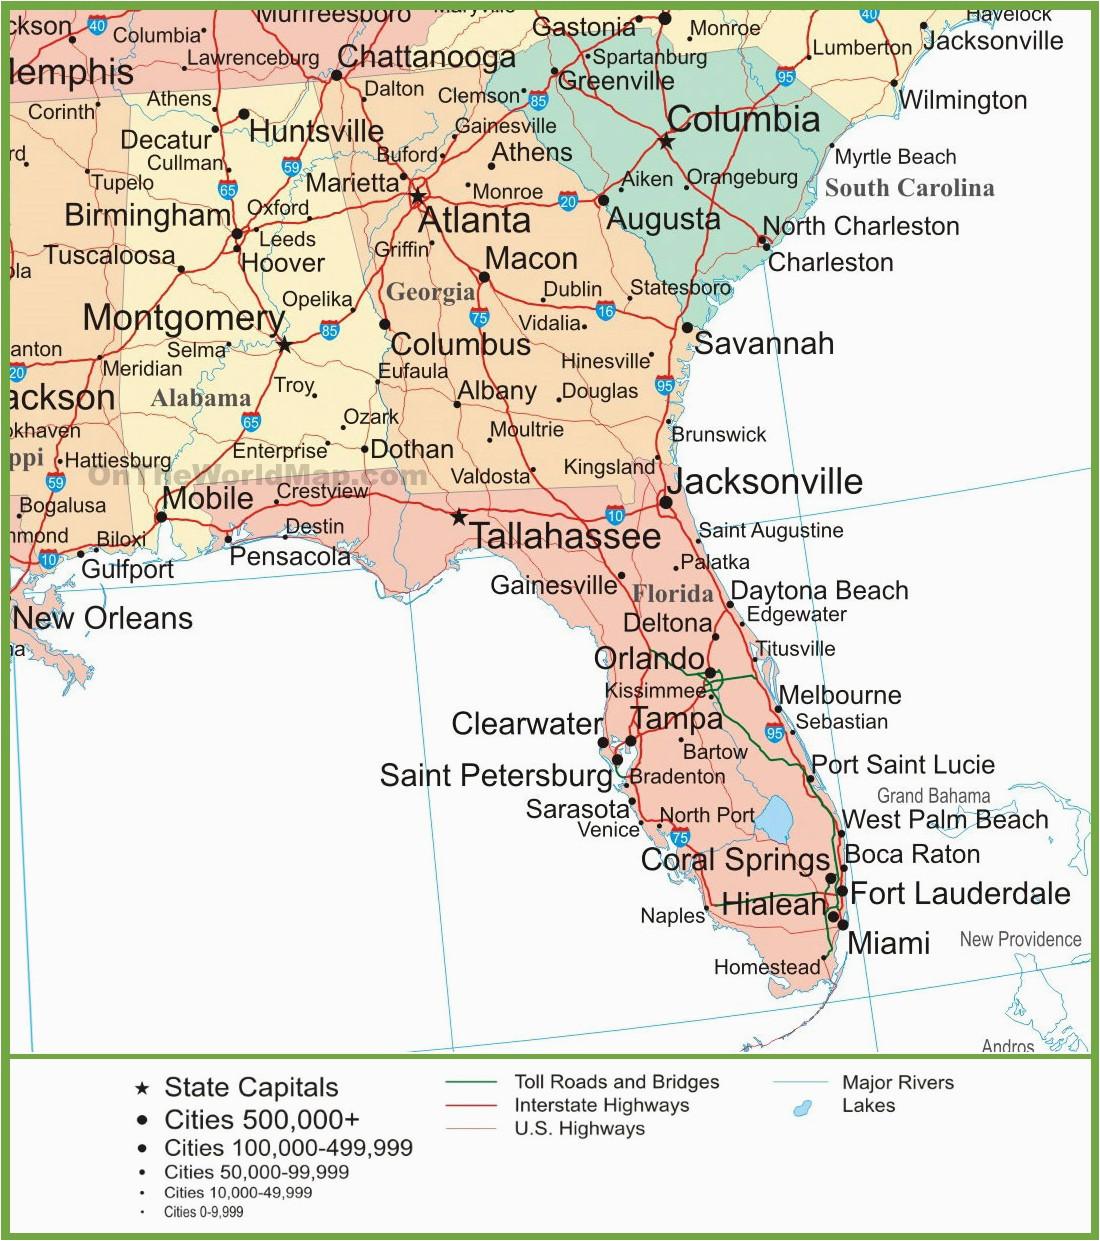 Rome Georgia Map Google Map Of Alabama Georgia and Florida ... on google map of chicago, florida state map with cities, google map miami florida, google map of silver springs, google map us 90 florida, google map of ocala, florida maps with counties and cities, google map of clearwater, google map of miami lakes, google map of hollywood, google map florida keys, google map of vero beach, google earth florida, google globe of south florida, google maps florida gulf coast,